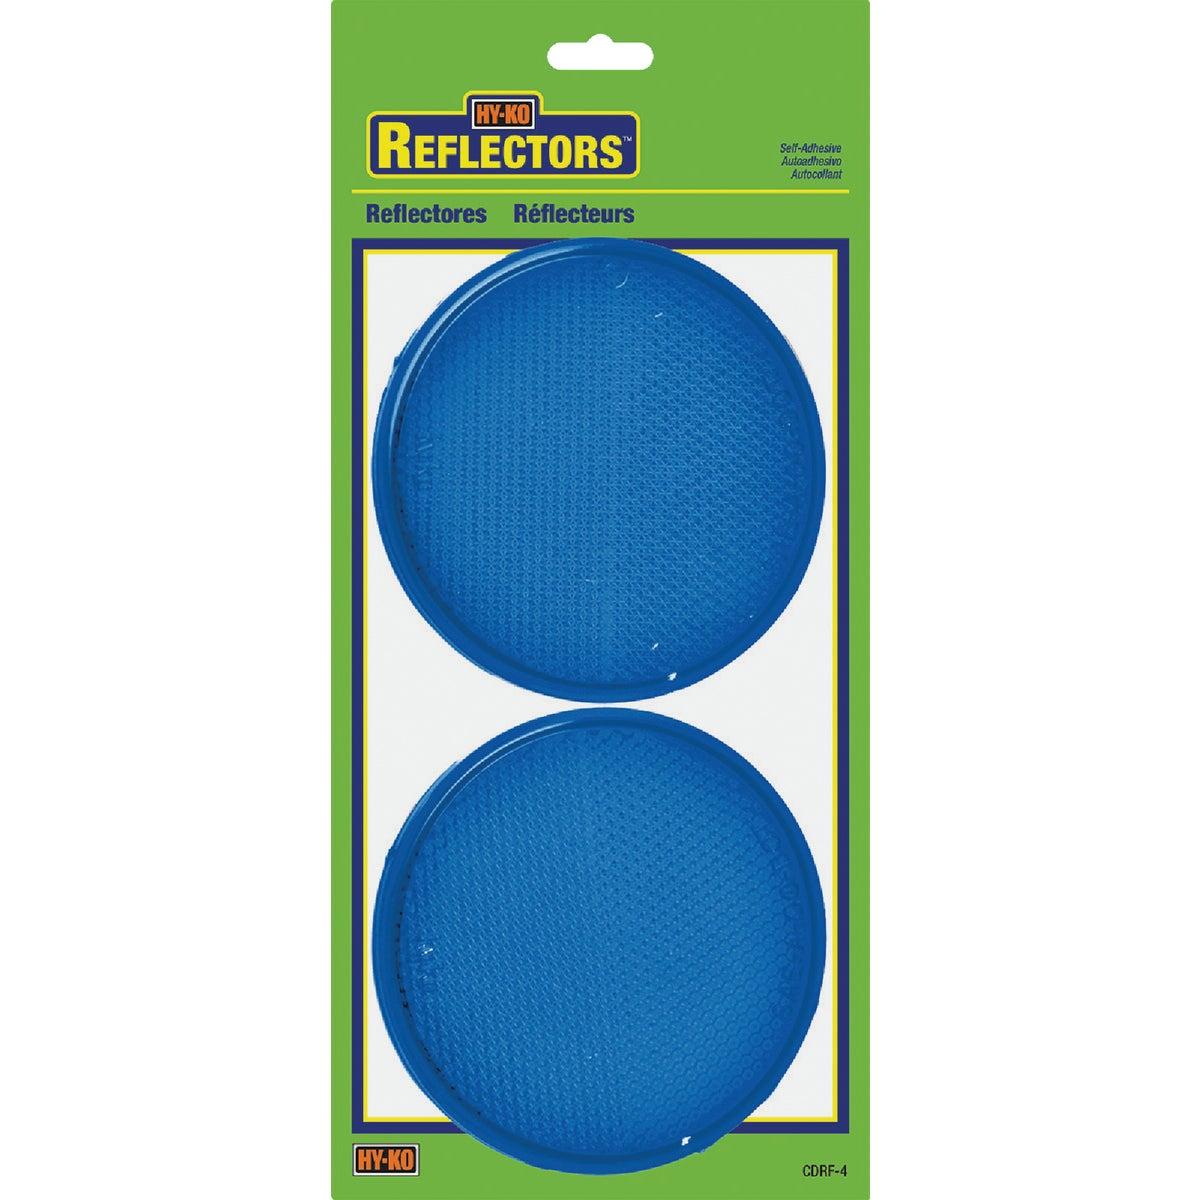 PRESS ON BLUE REFLECTORS